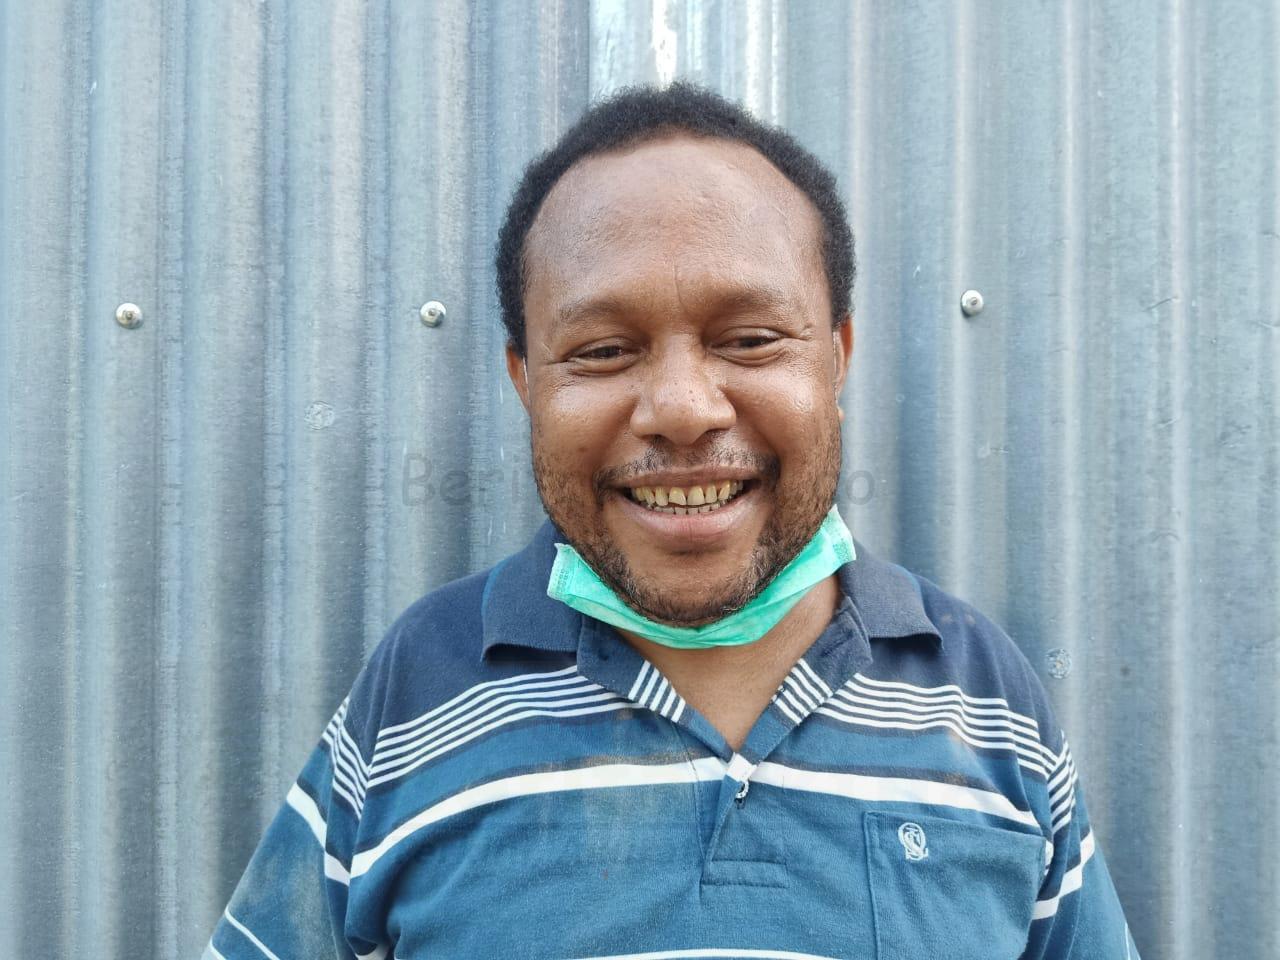 Franky Awom: HEBO Kuat, Menang 80 Persen di Pilkada Manokwari 7 IMG 20201205 WA0026